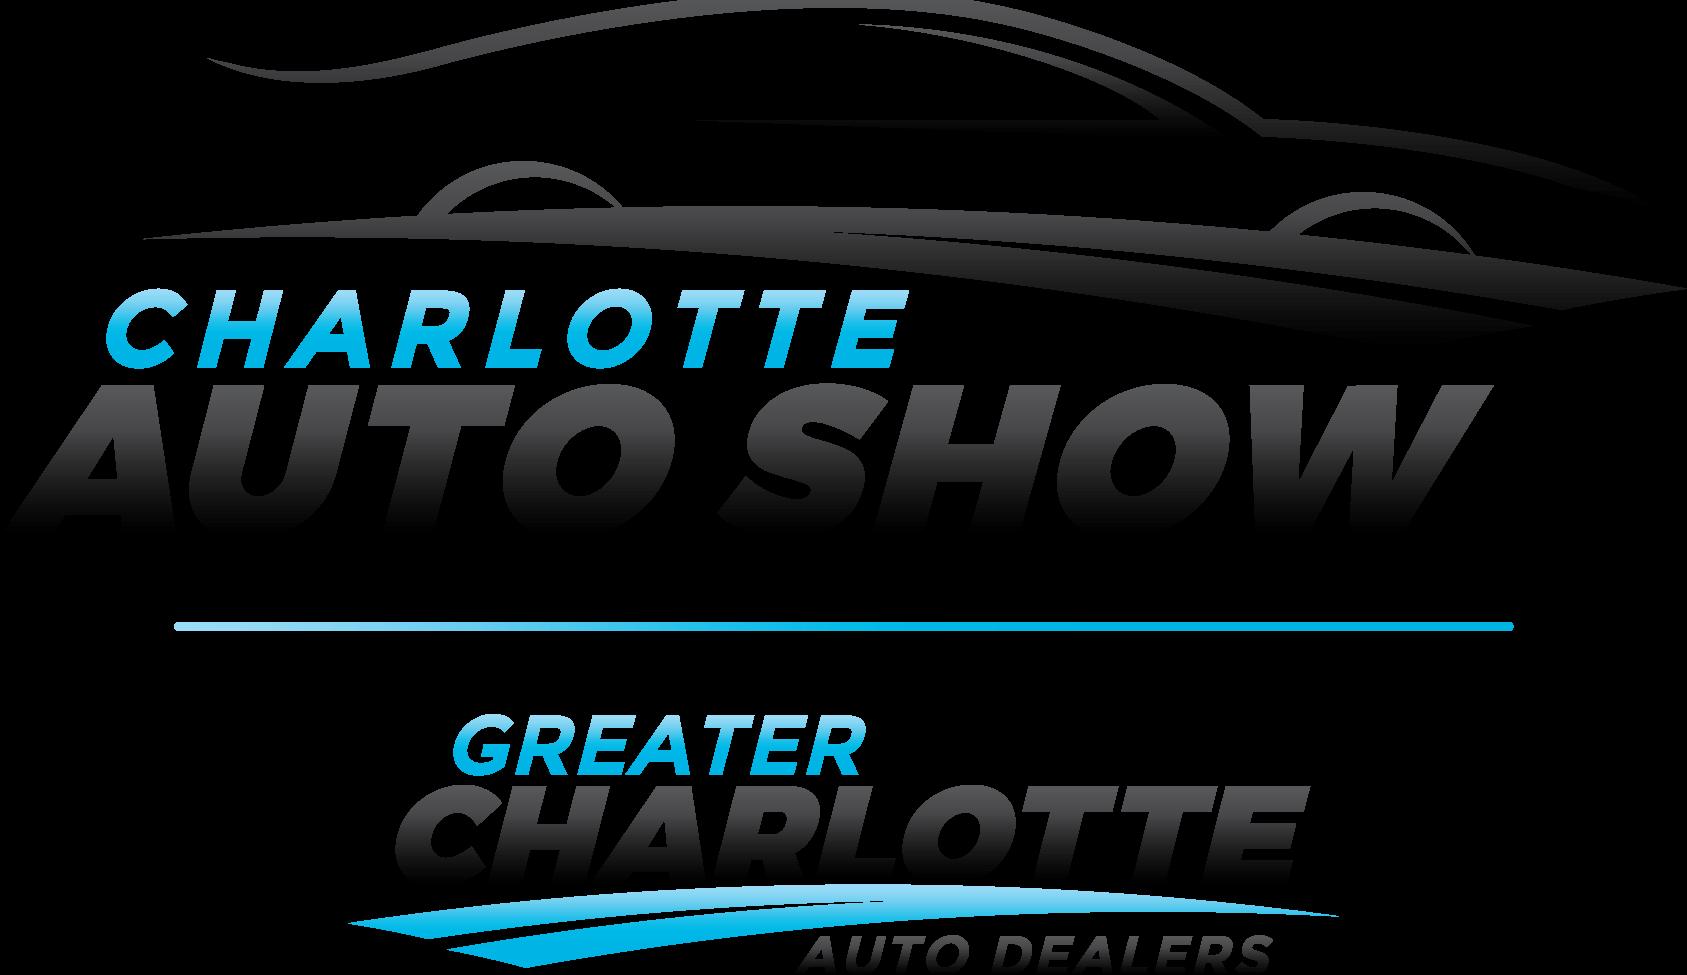 Charlotte Auto Dealers